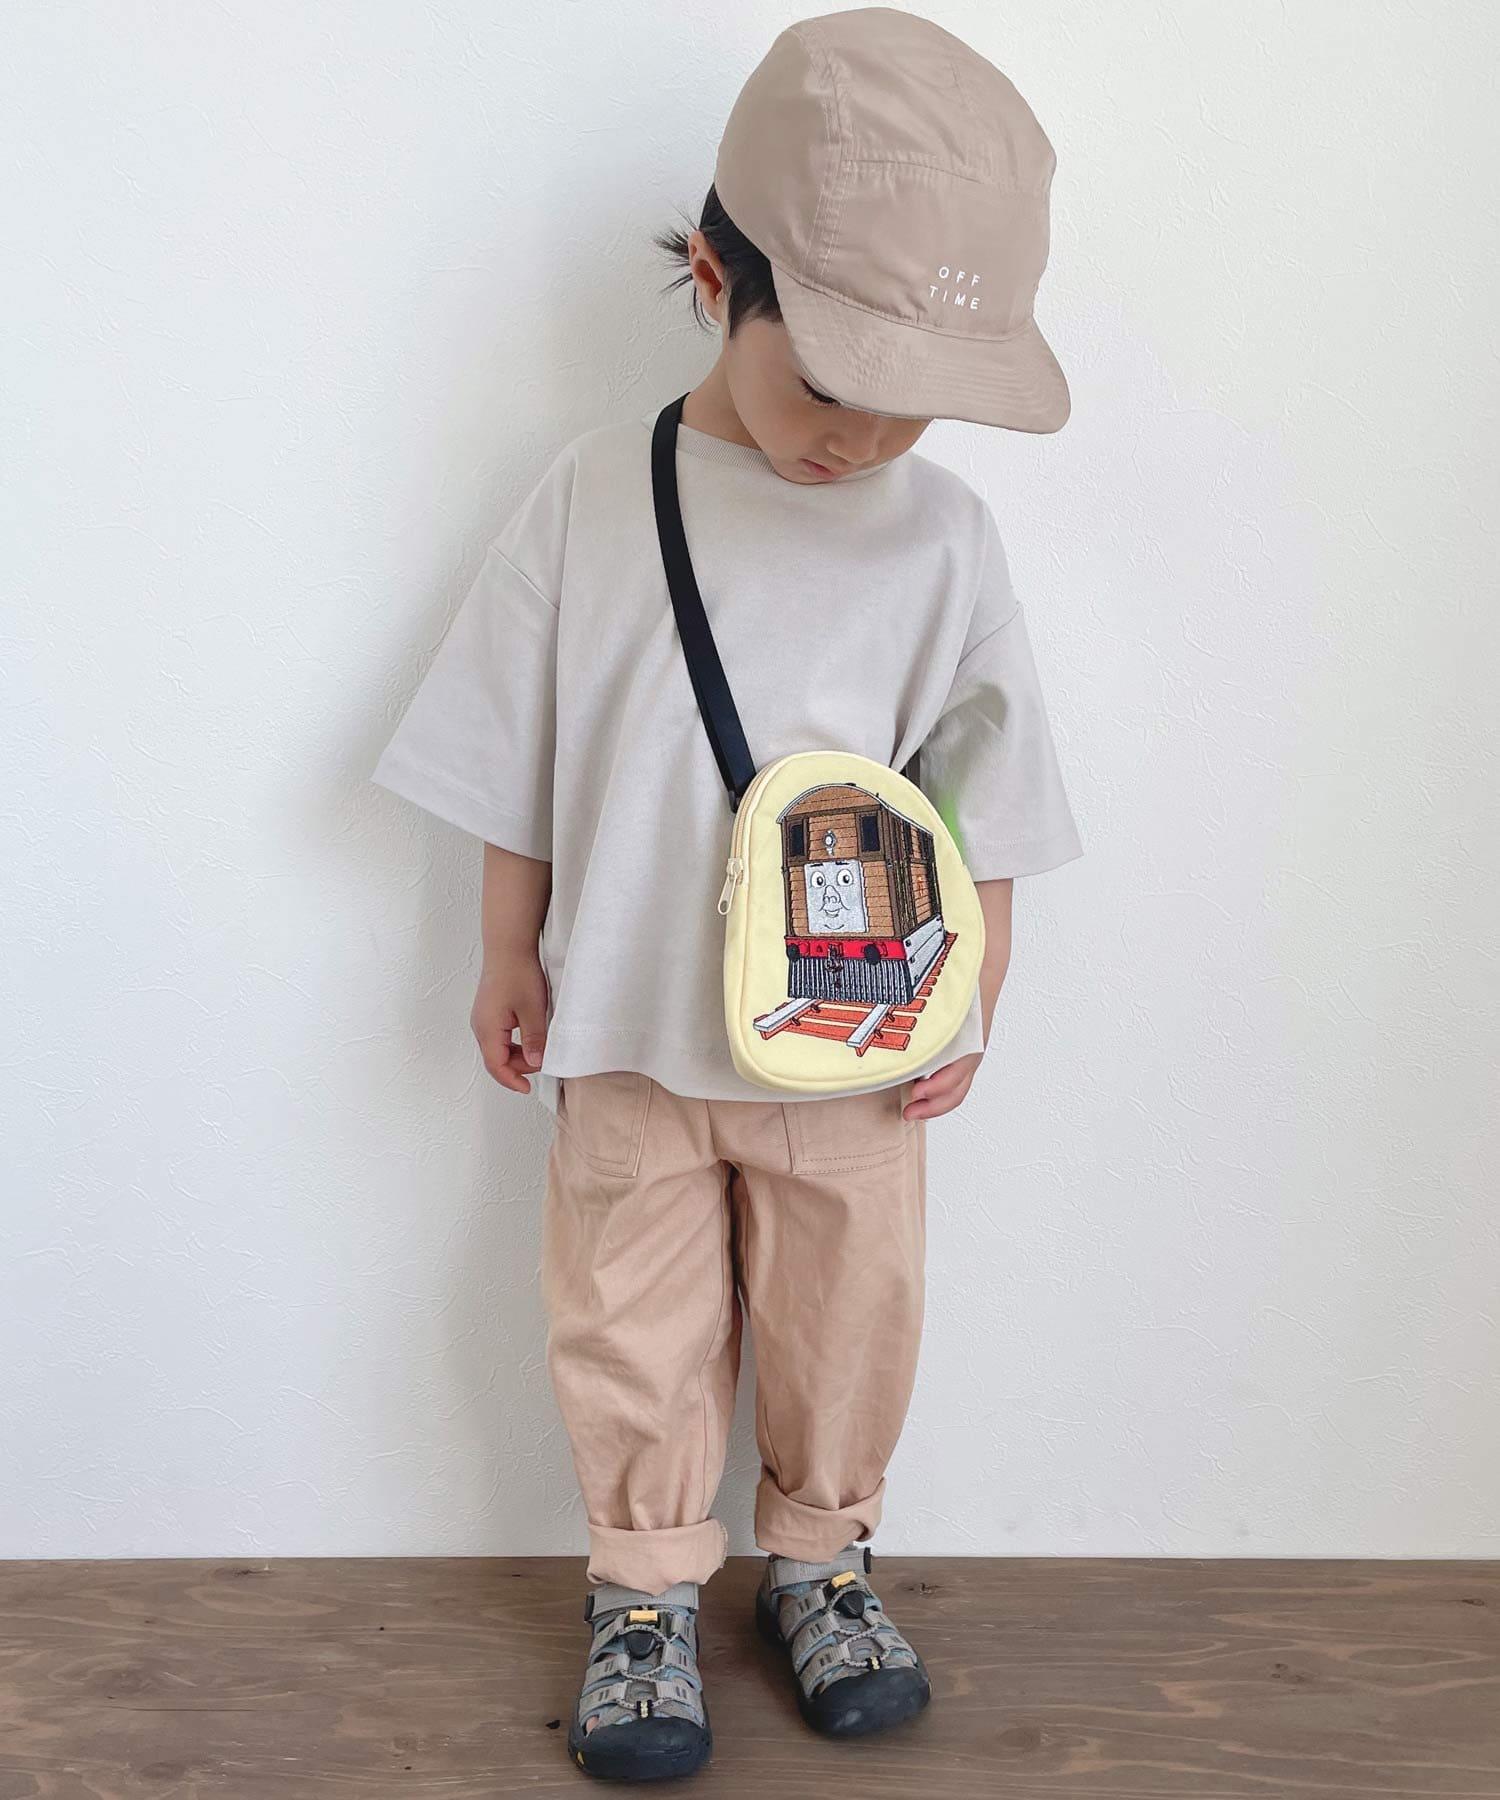 CIAOPANIC TYPY(チャオパニックティピー) キッズ 【KIDS】【きかんしゃトーマス】コラボ ダイカットサコッシュ ベージュ